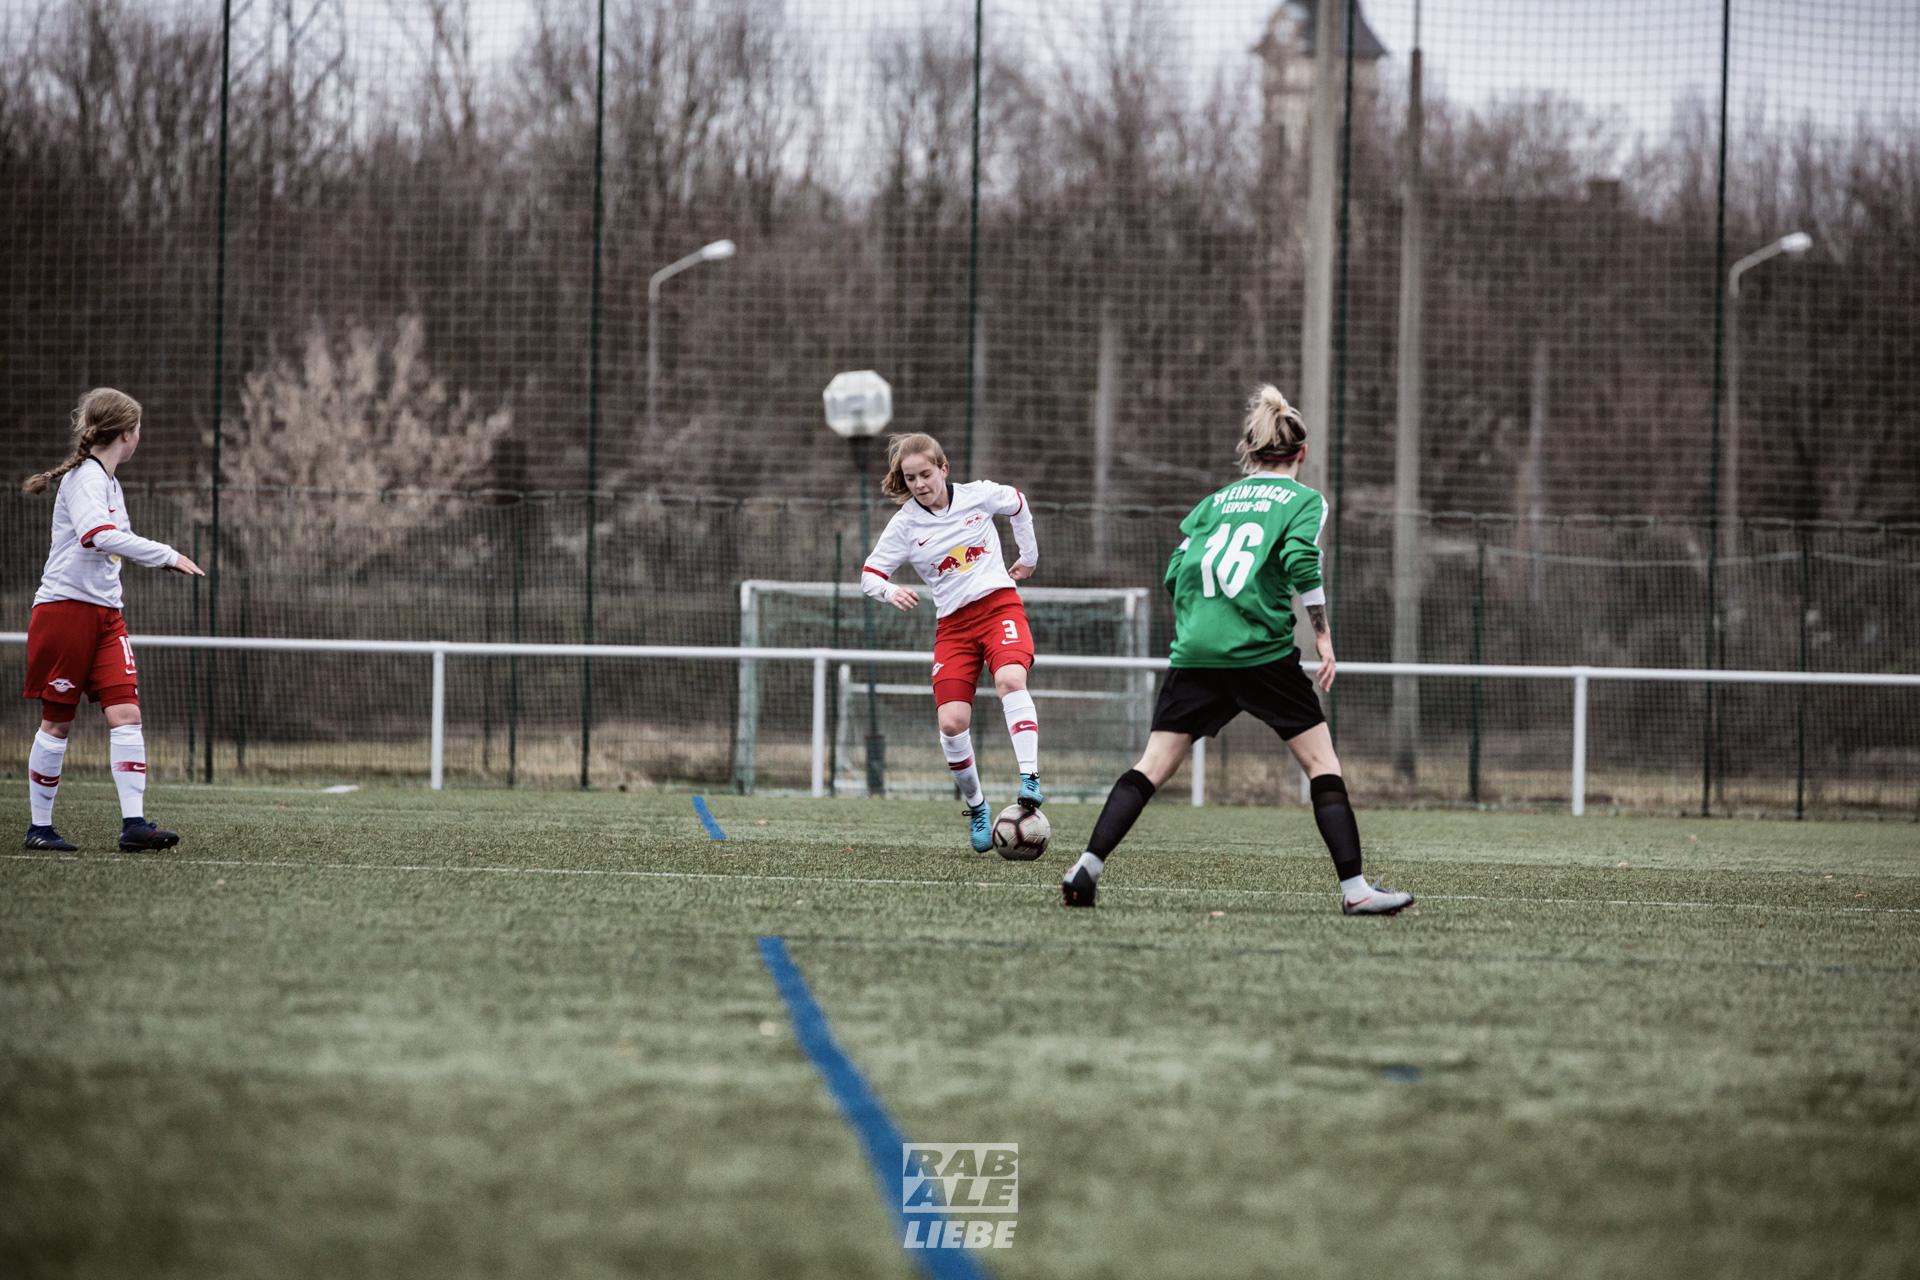 Testspiel: RB Leipzig II -vs- SV Eintracht Leipzig-Süd